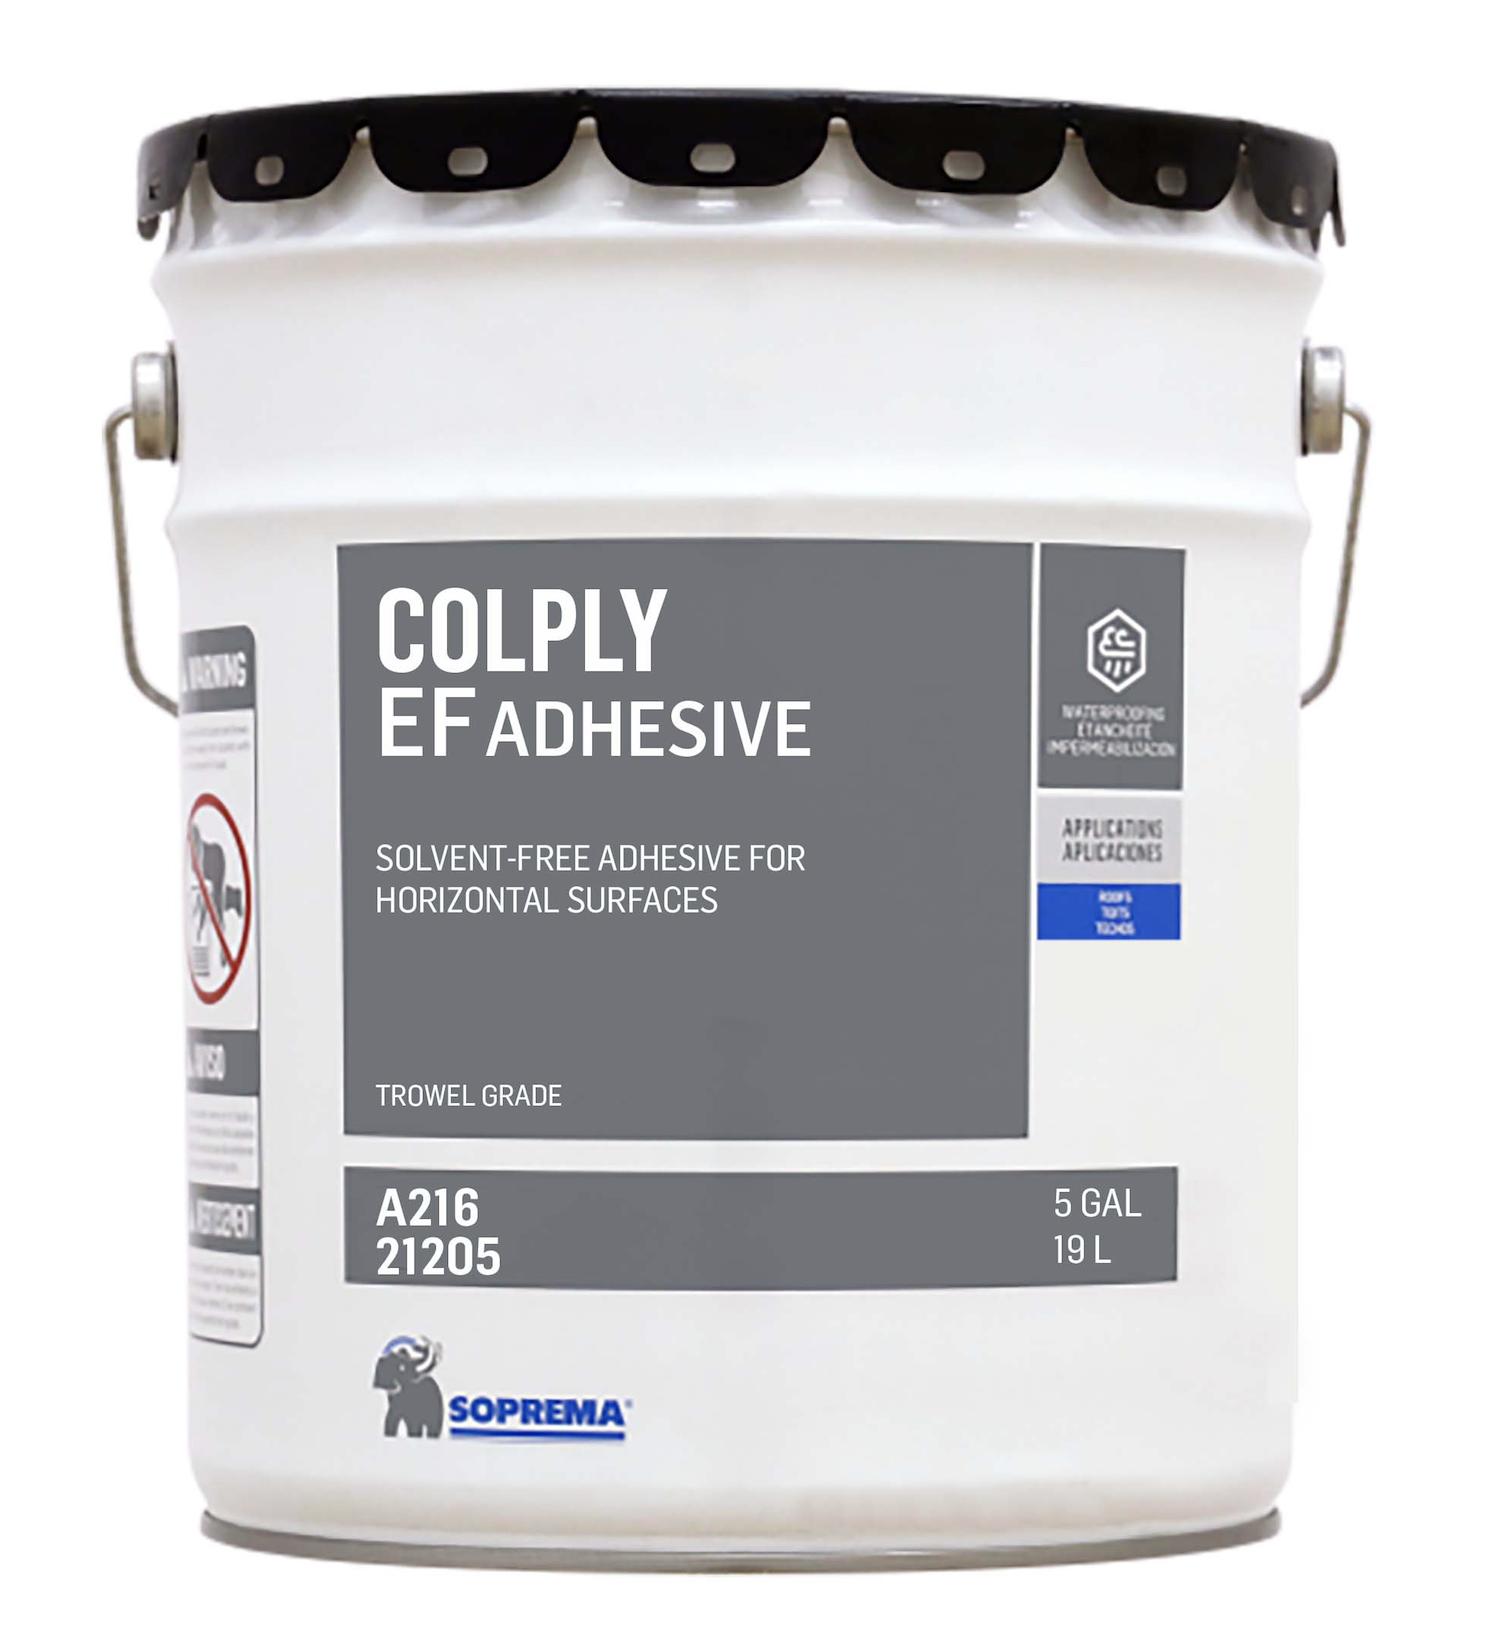 Soprema offers COLPLY EF adhesive